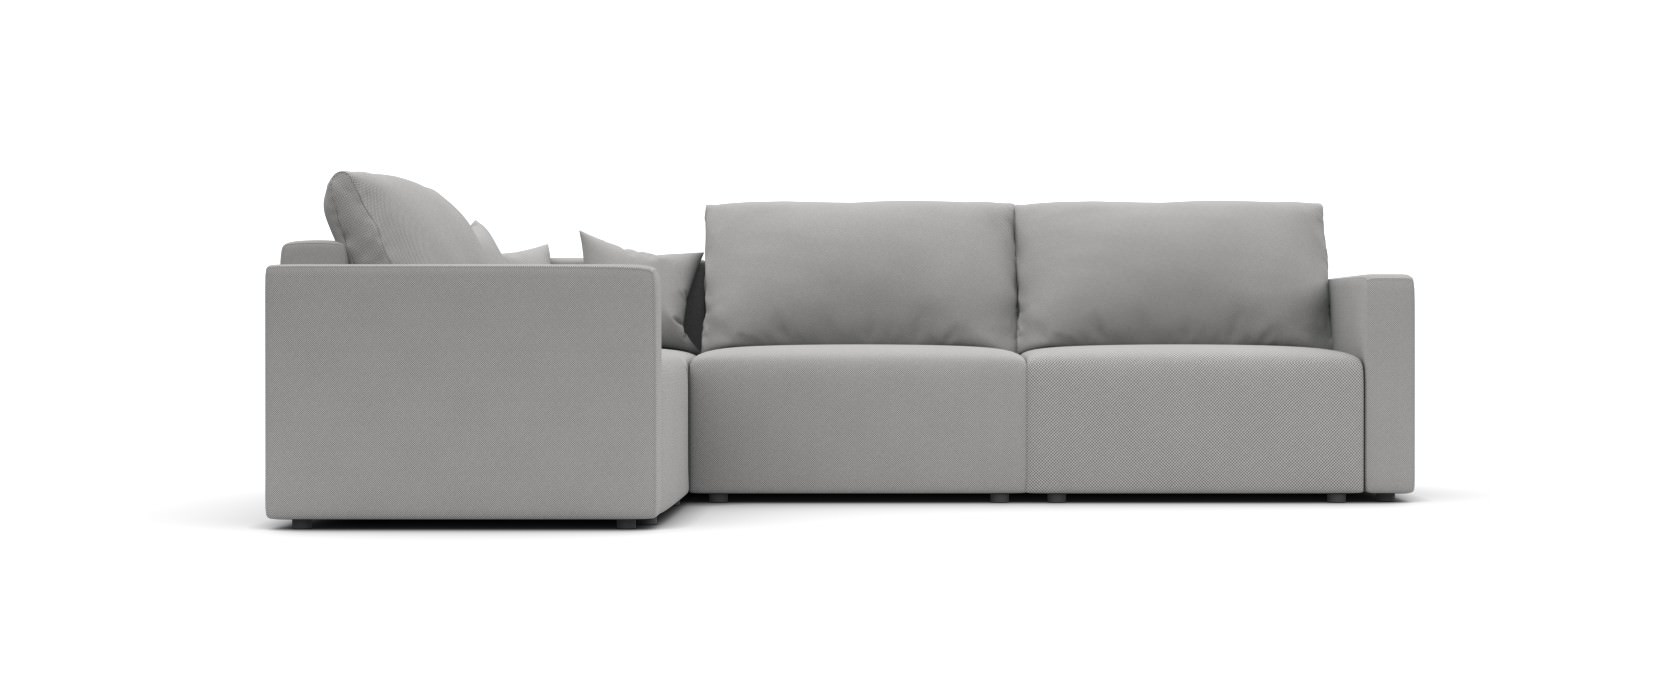 Модульний диван Greta 317x217 - Pufetto